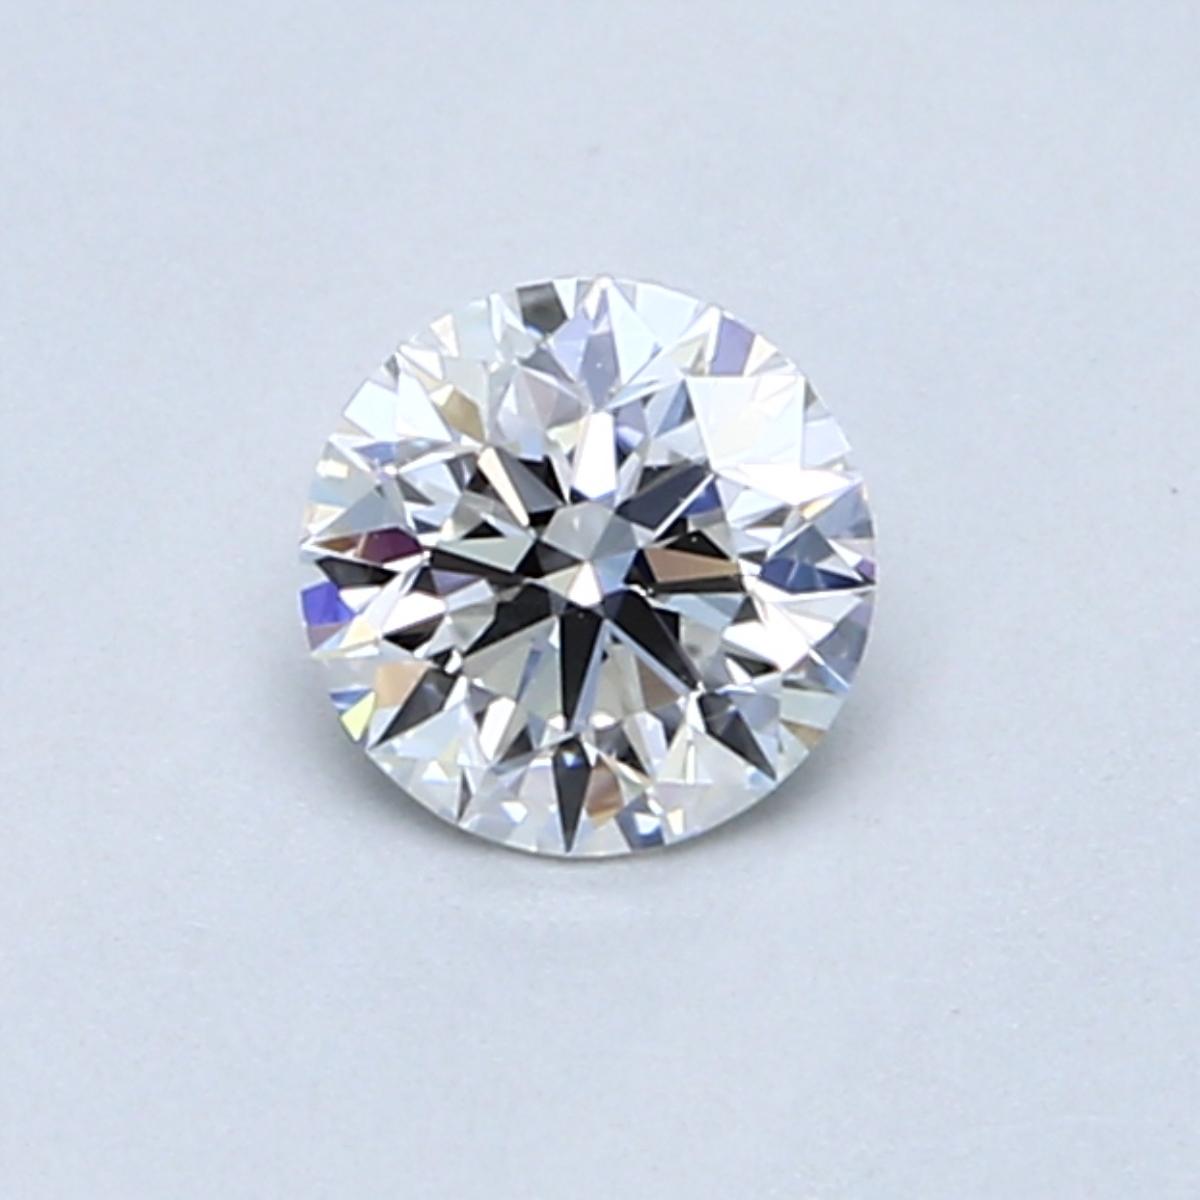 0.50 Carat E SI2 Round Diamond